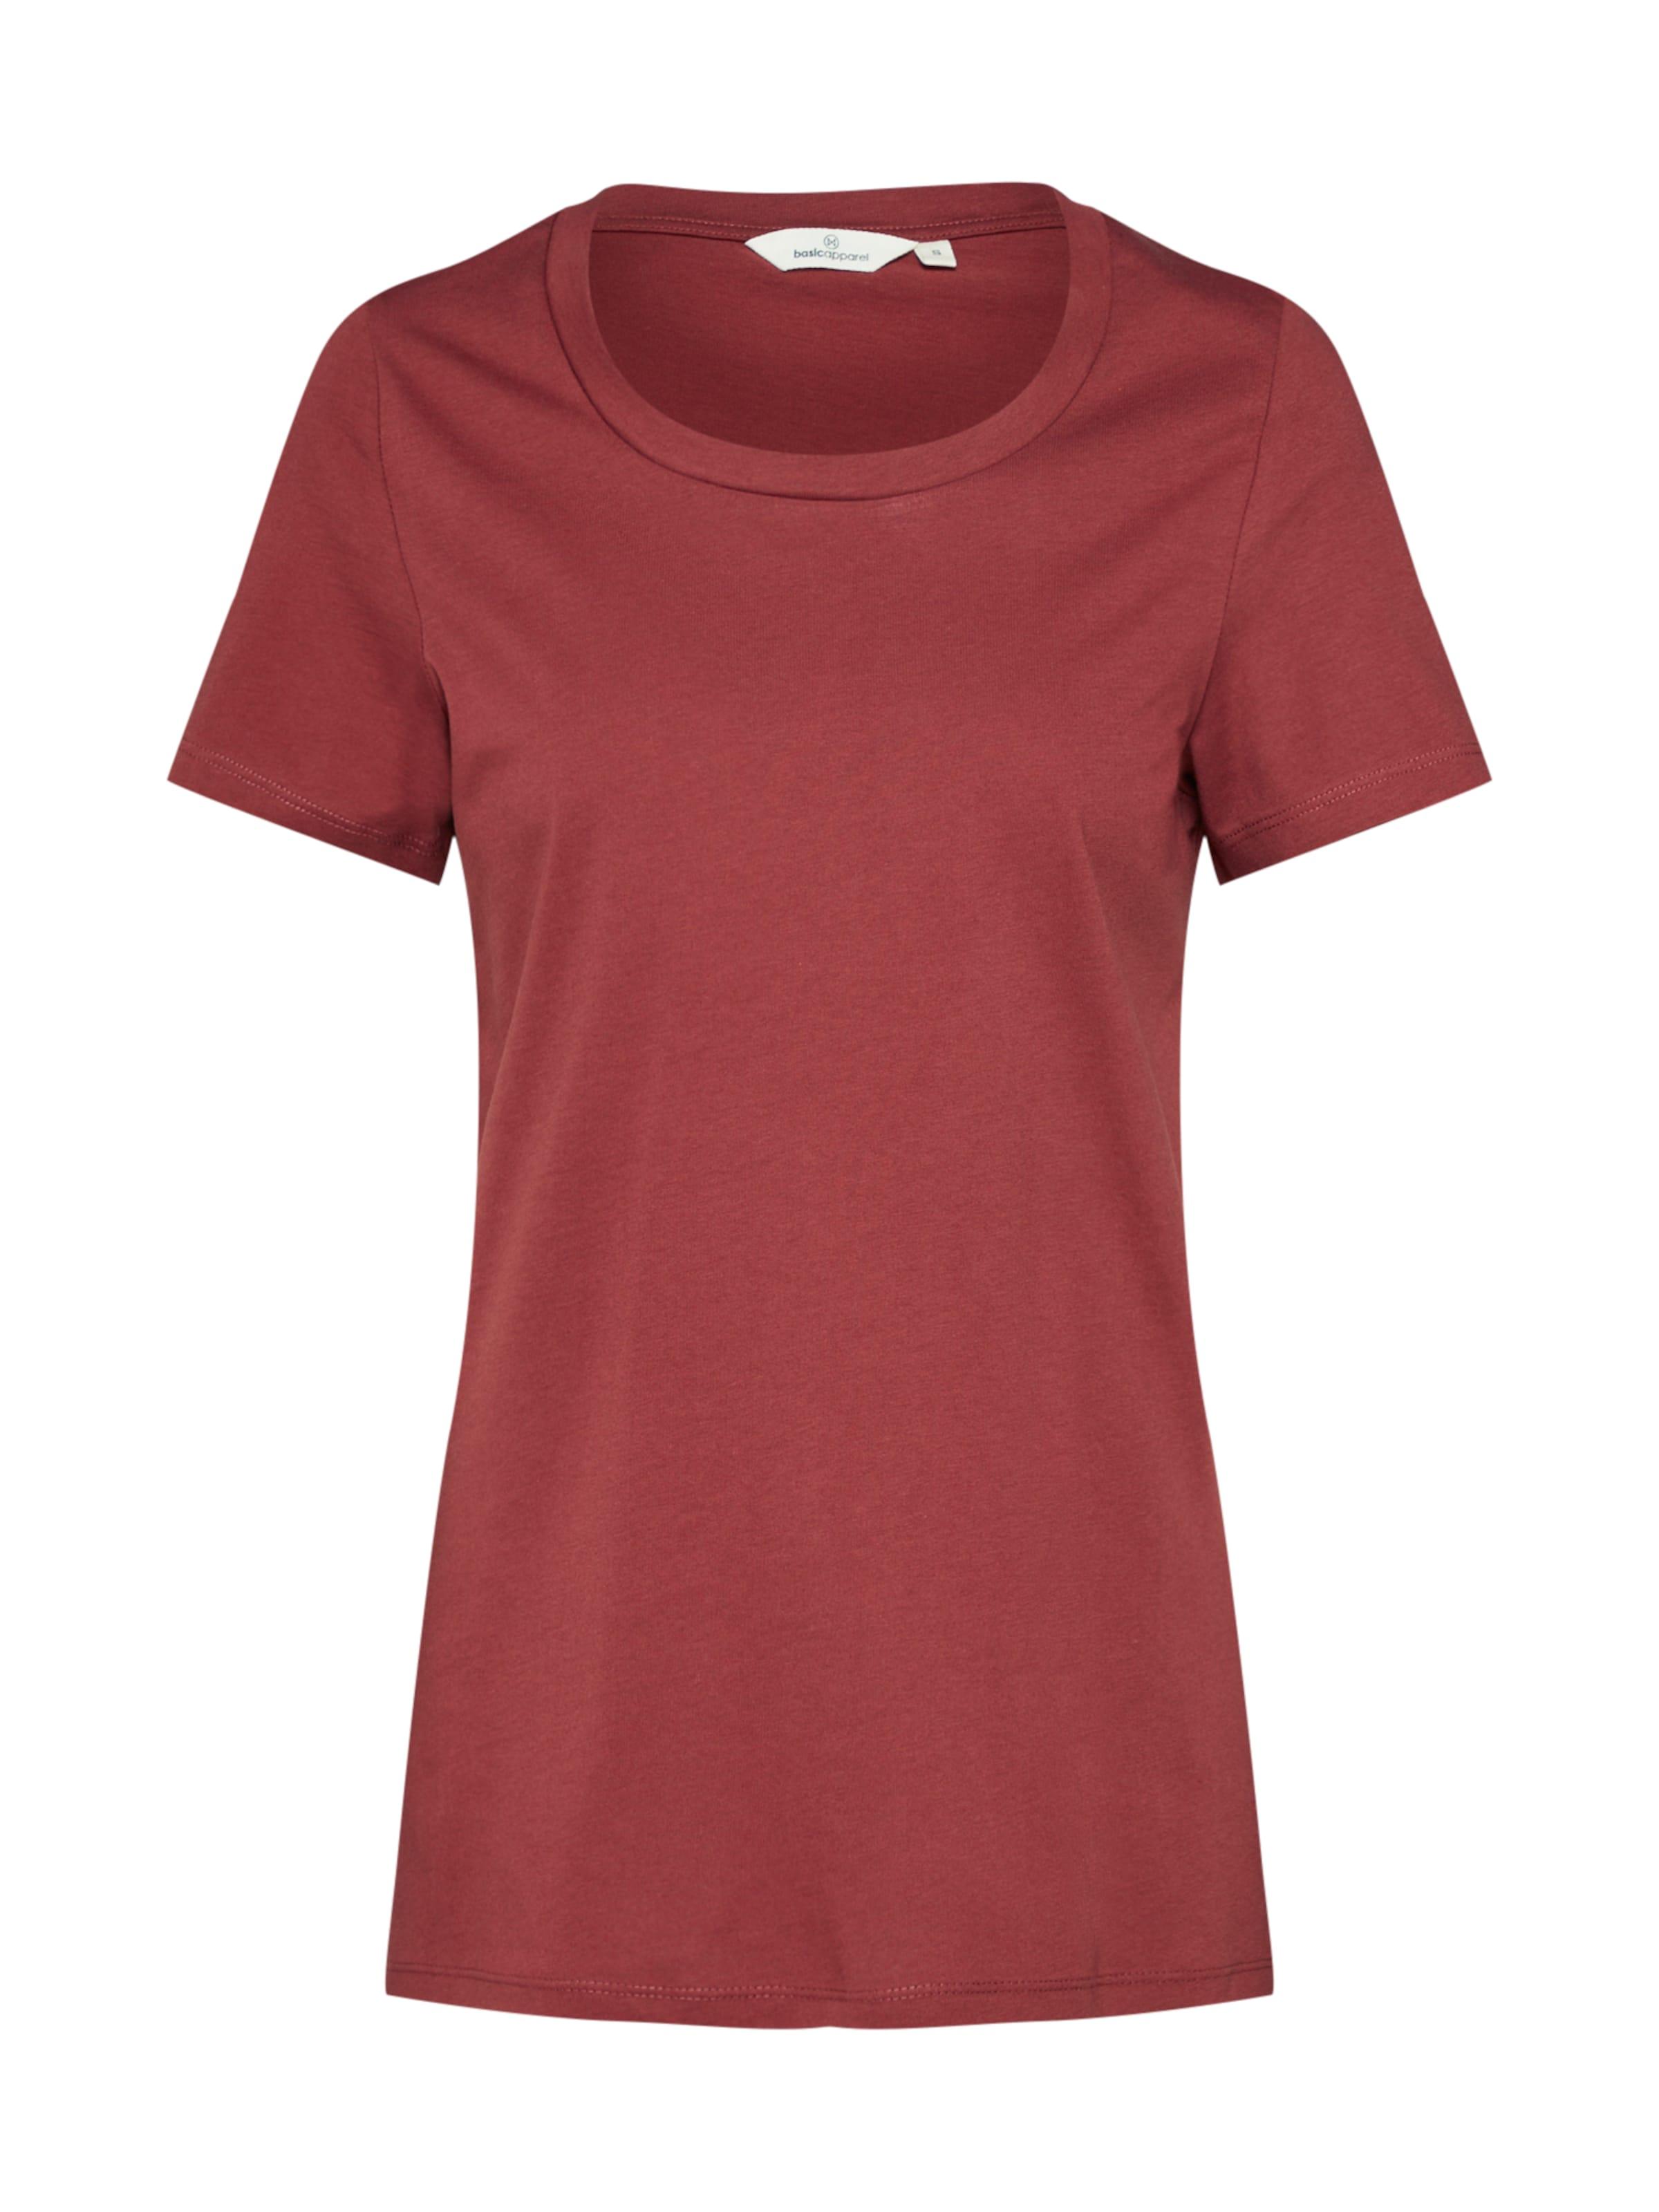 shirt Apparel T En Basic 'rebekka' Rouge dBoCxe